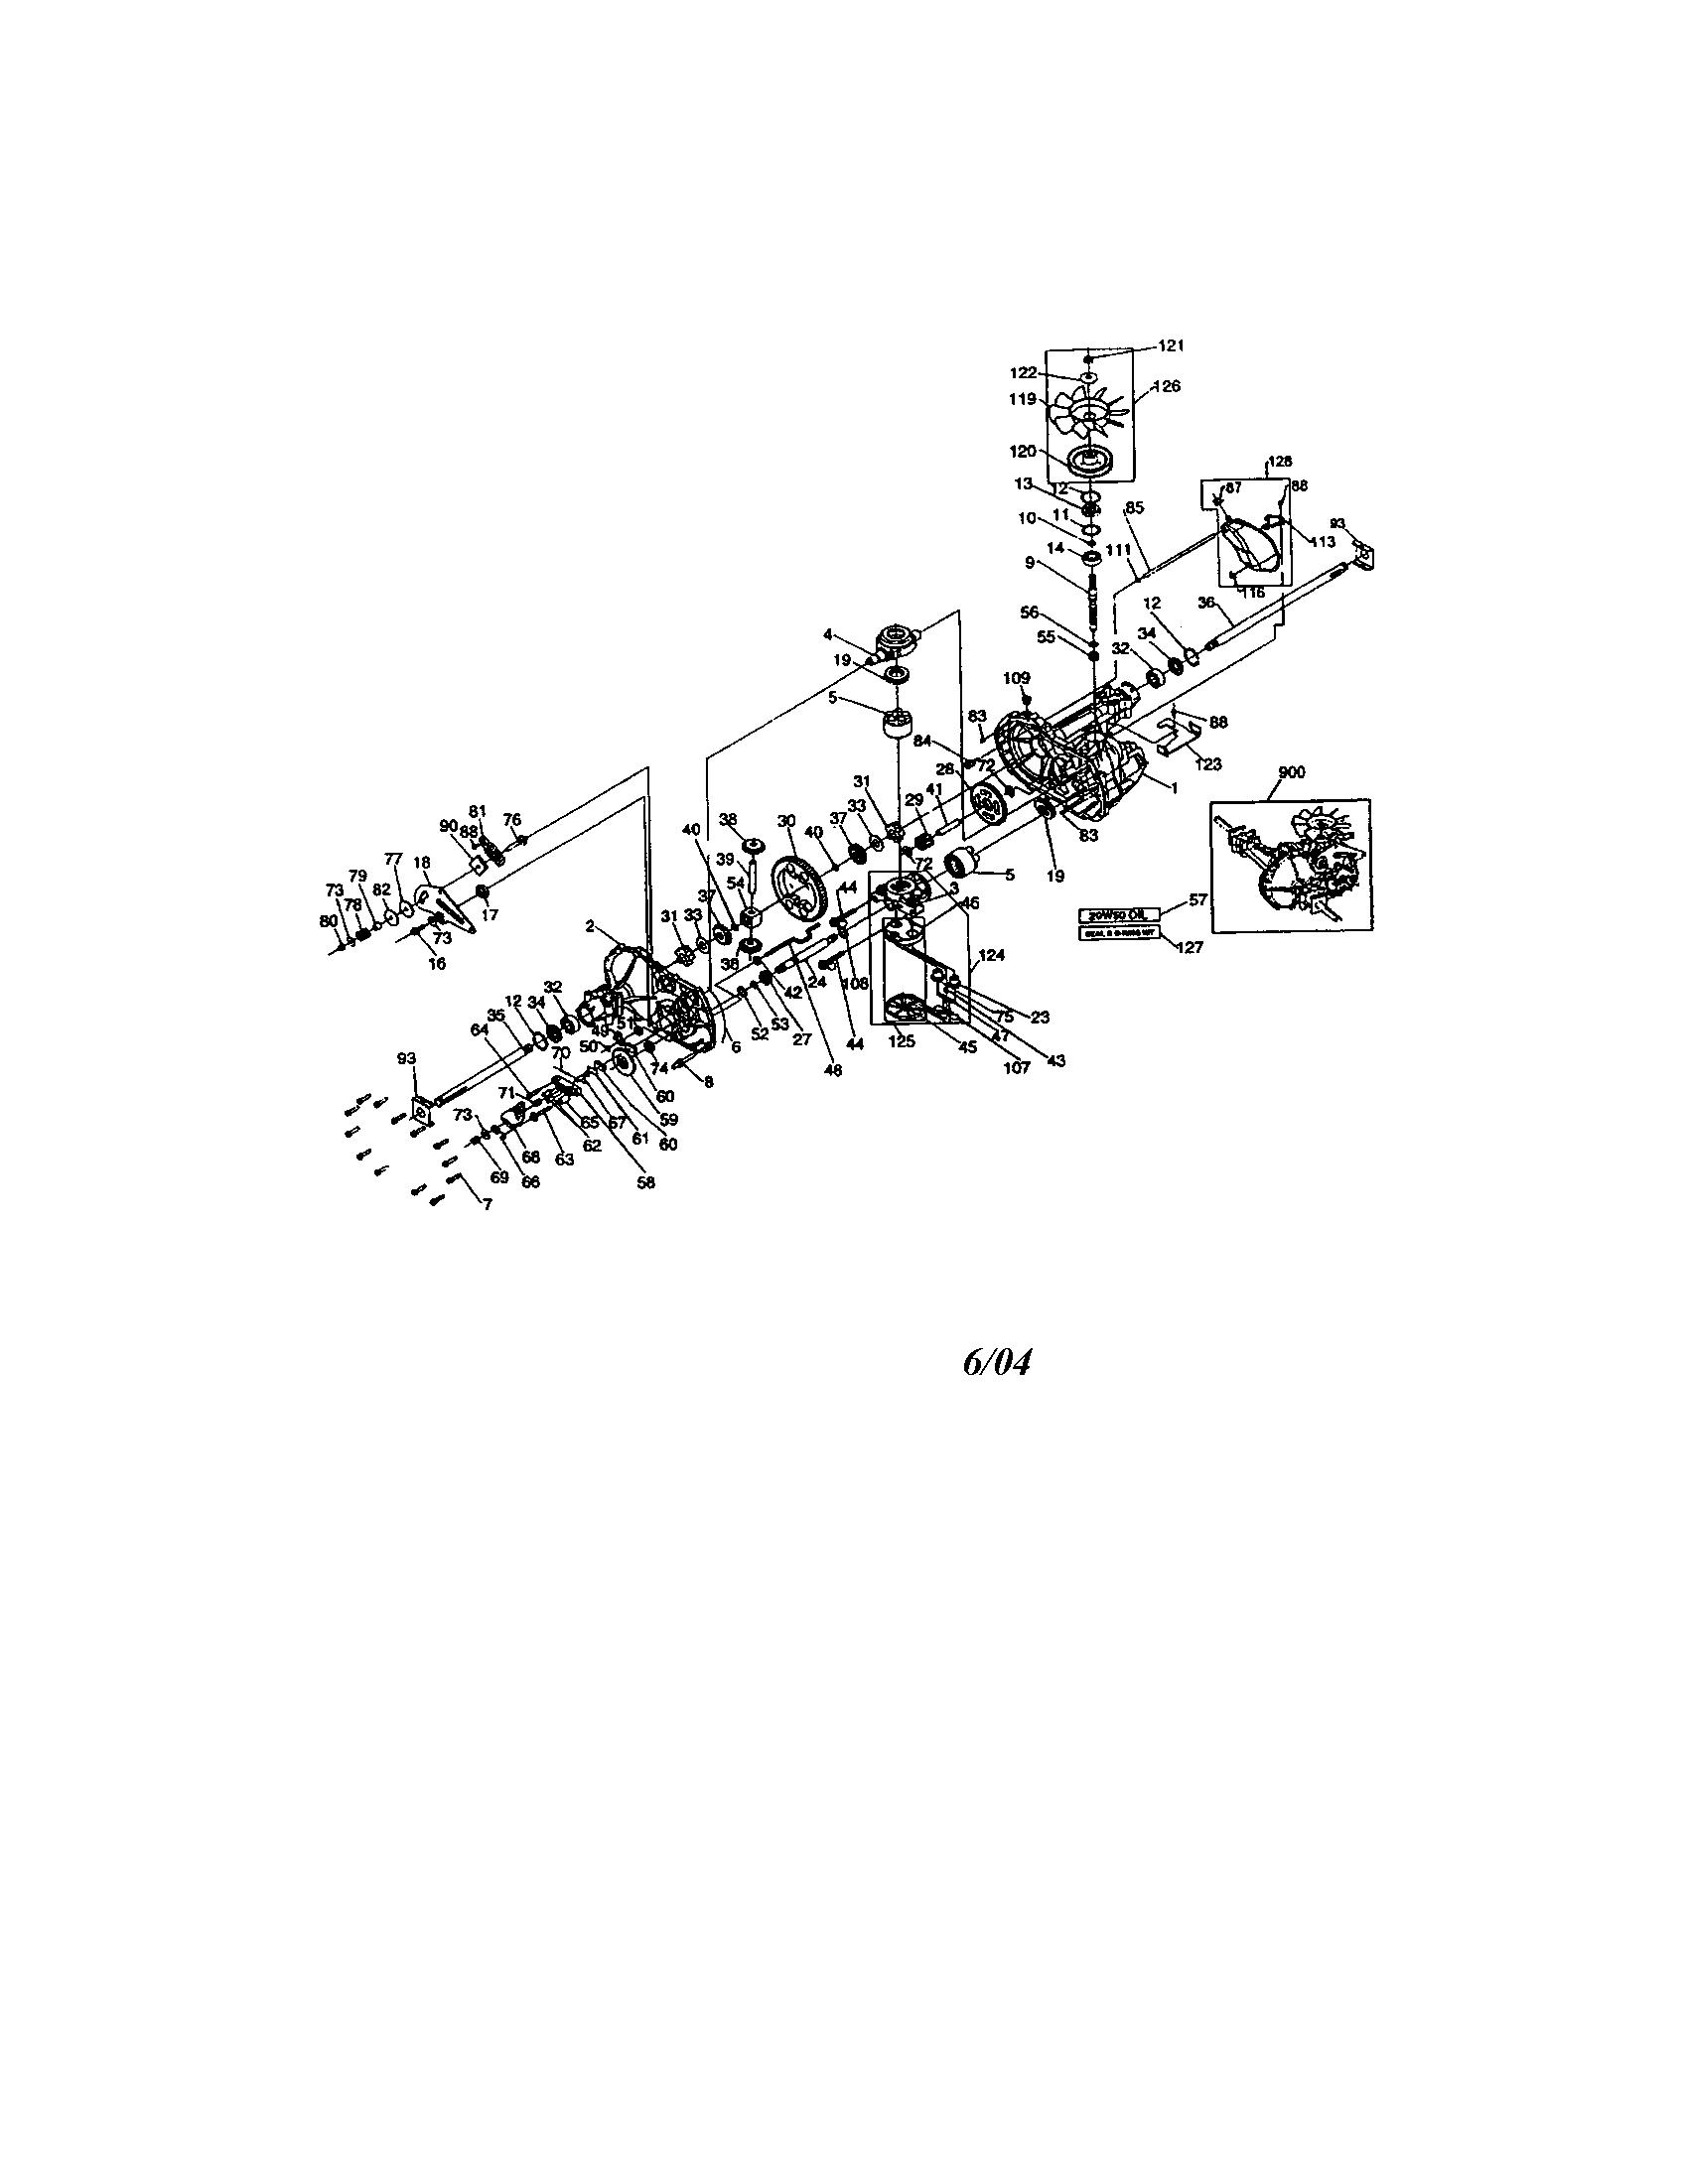 Model # 917273140 Craftsman Tractor Mower deck (97 parts